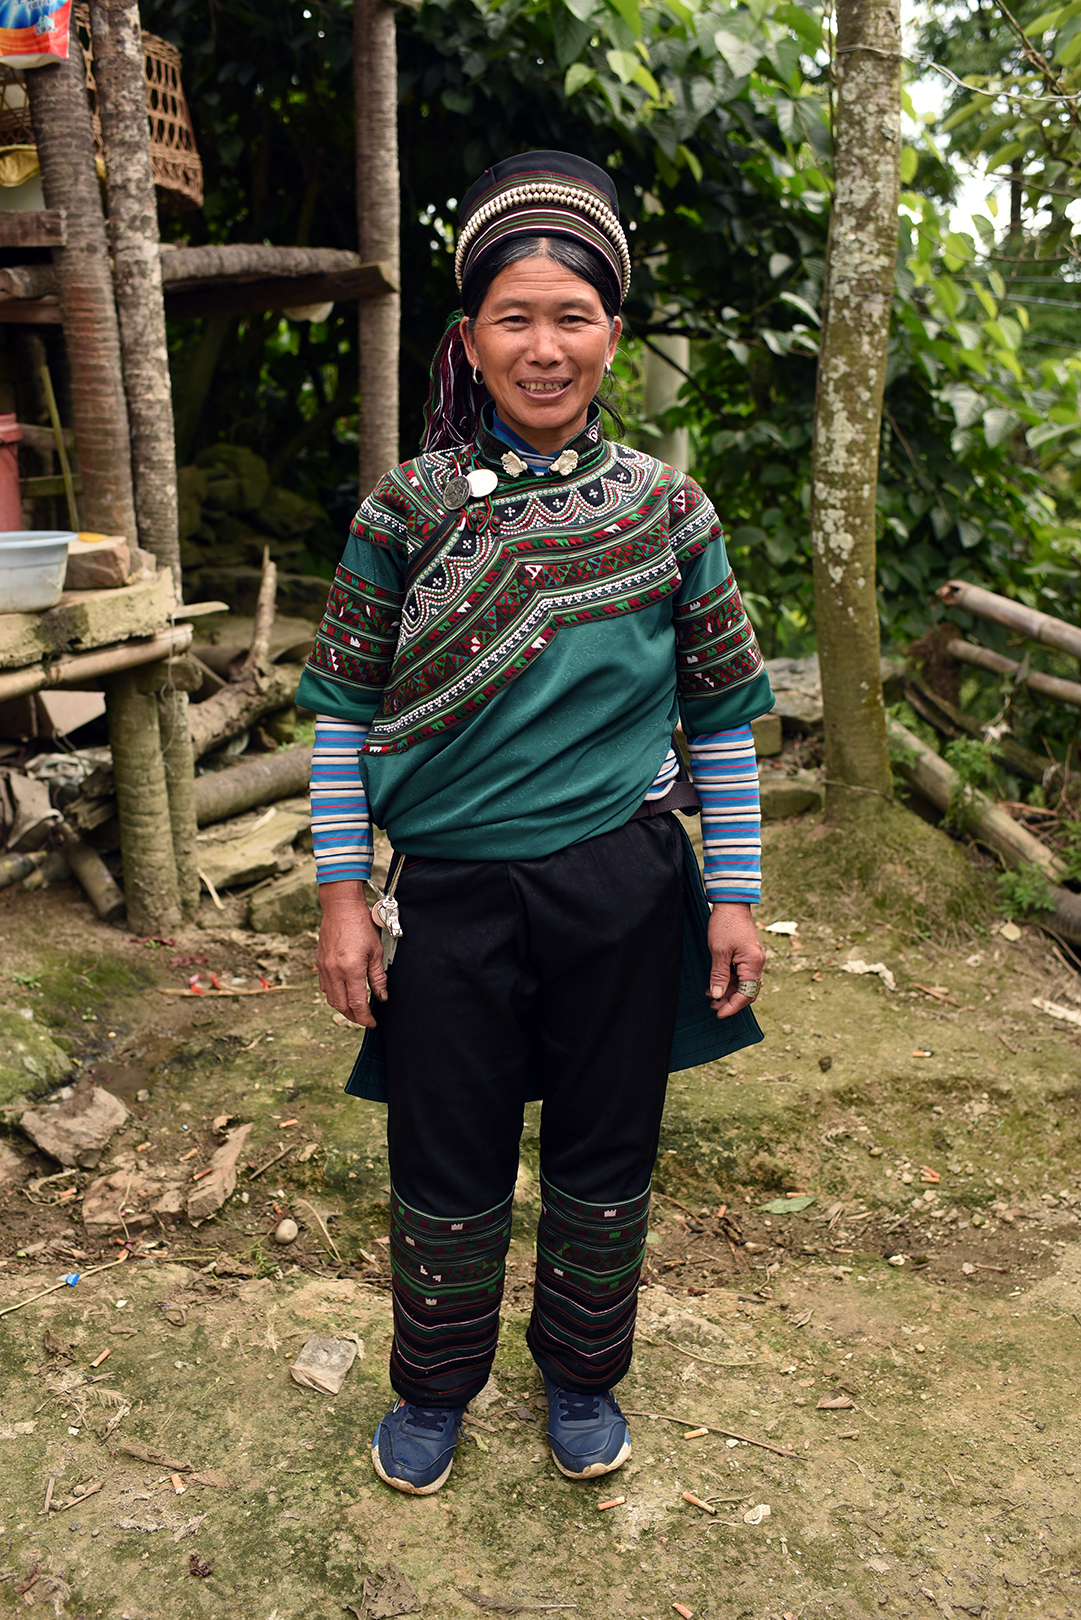 Hani woman and member of polyphonic singing intangible cultural heritage, Puchun village, Yunnan, 2017.